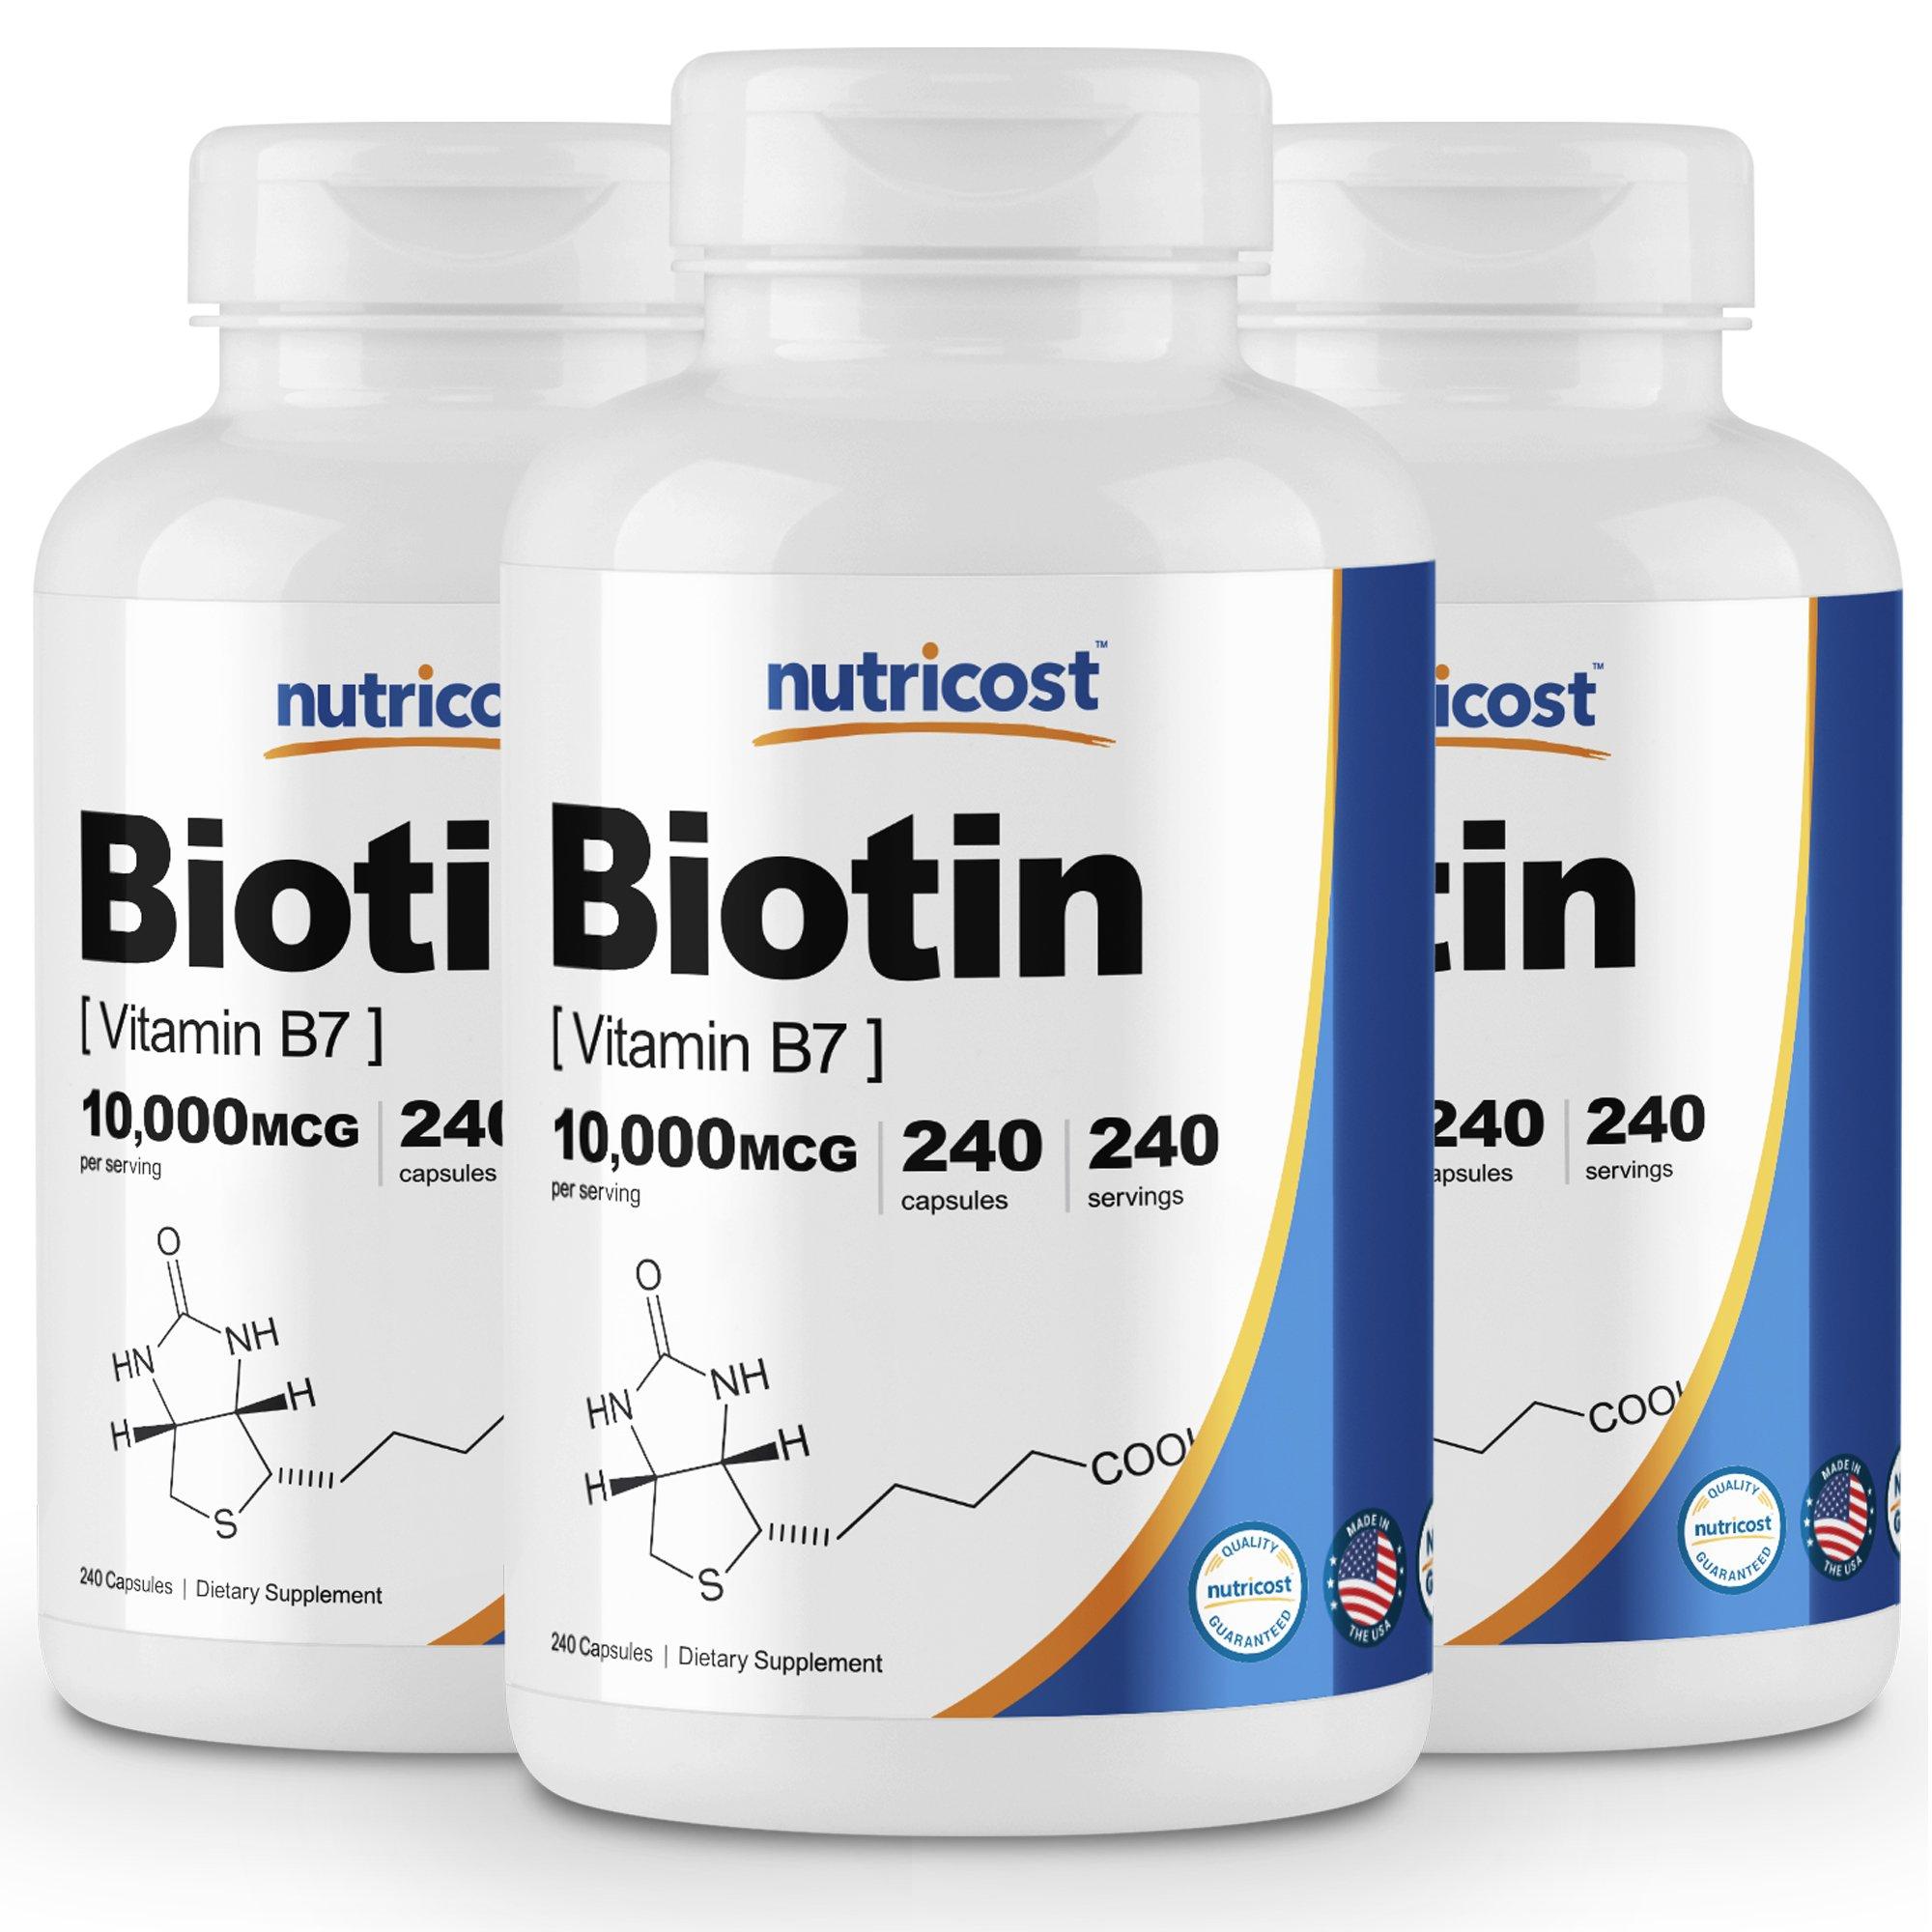 Nutricost Biotin (Vitamin B7) 10,000mcg, 240 Caps (3 Bottles) - Veggie Caps, Non-GMO, Gluten Free